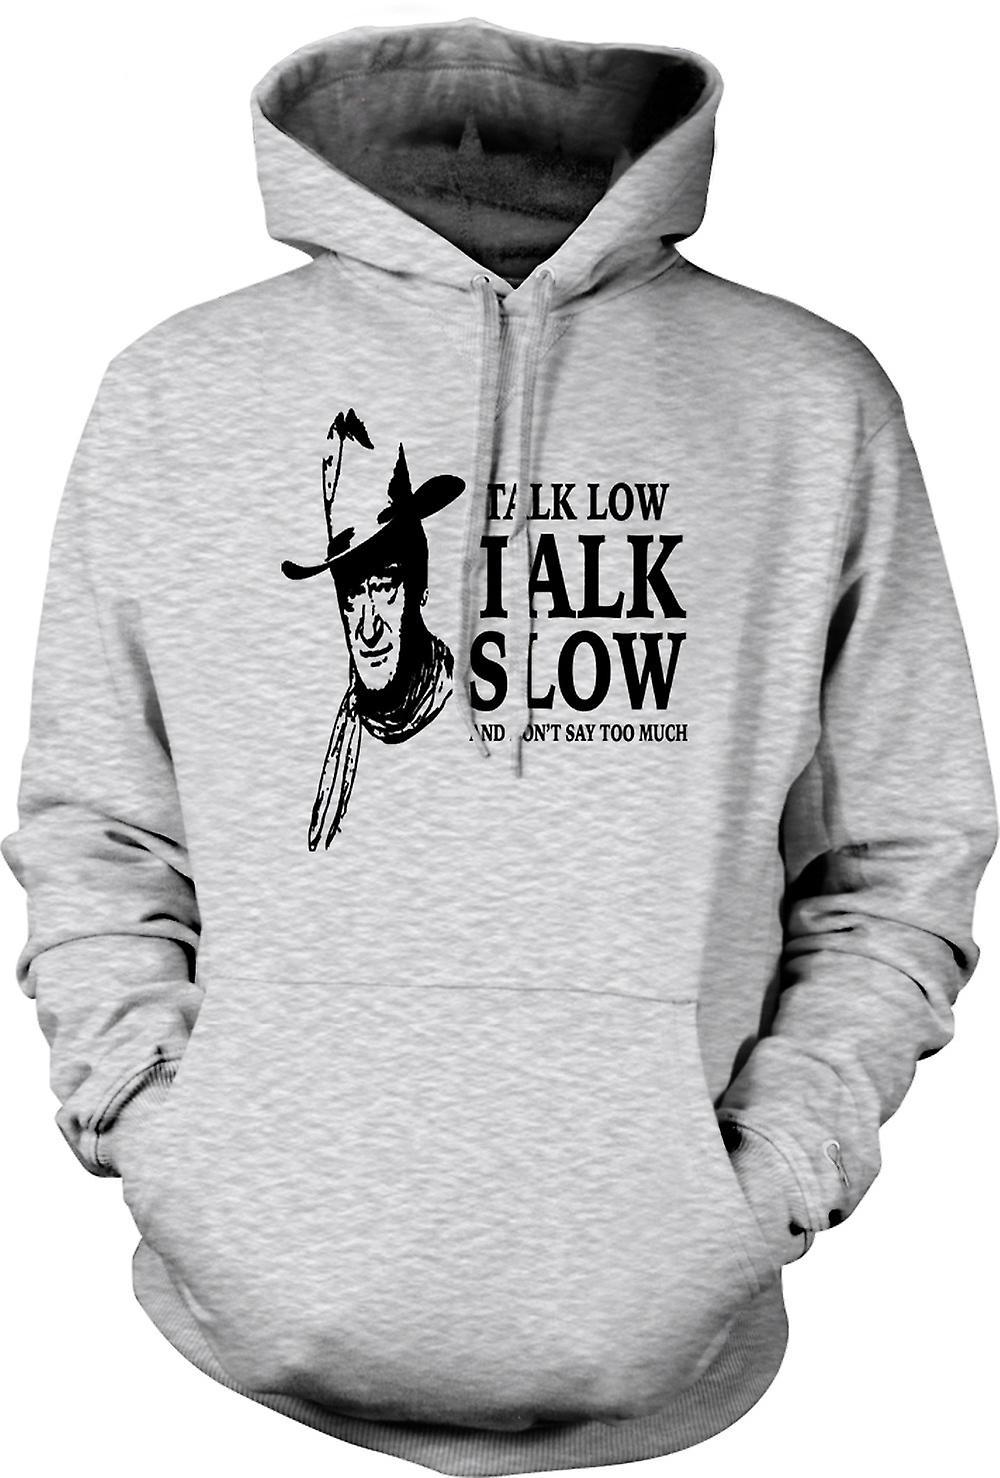 Mens Hoodie - John Wayne Talk låg - Cowboy Western